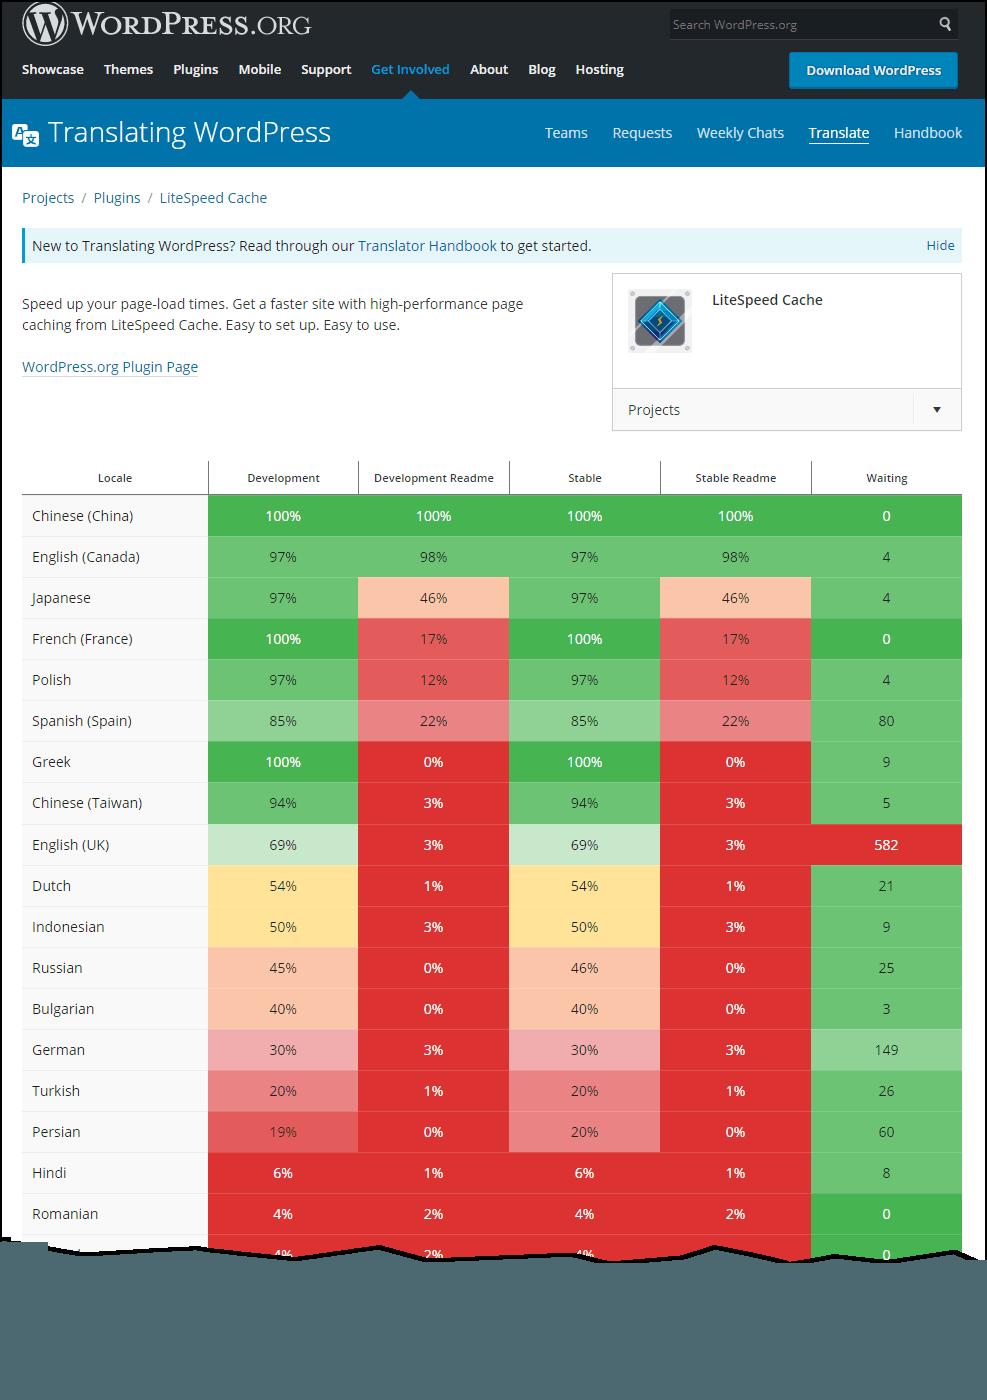 Translating LSCache for WordPress: Languages We Need